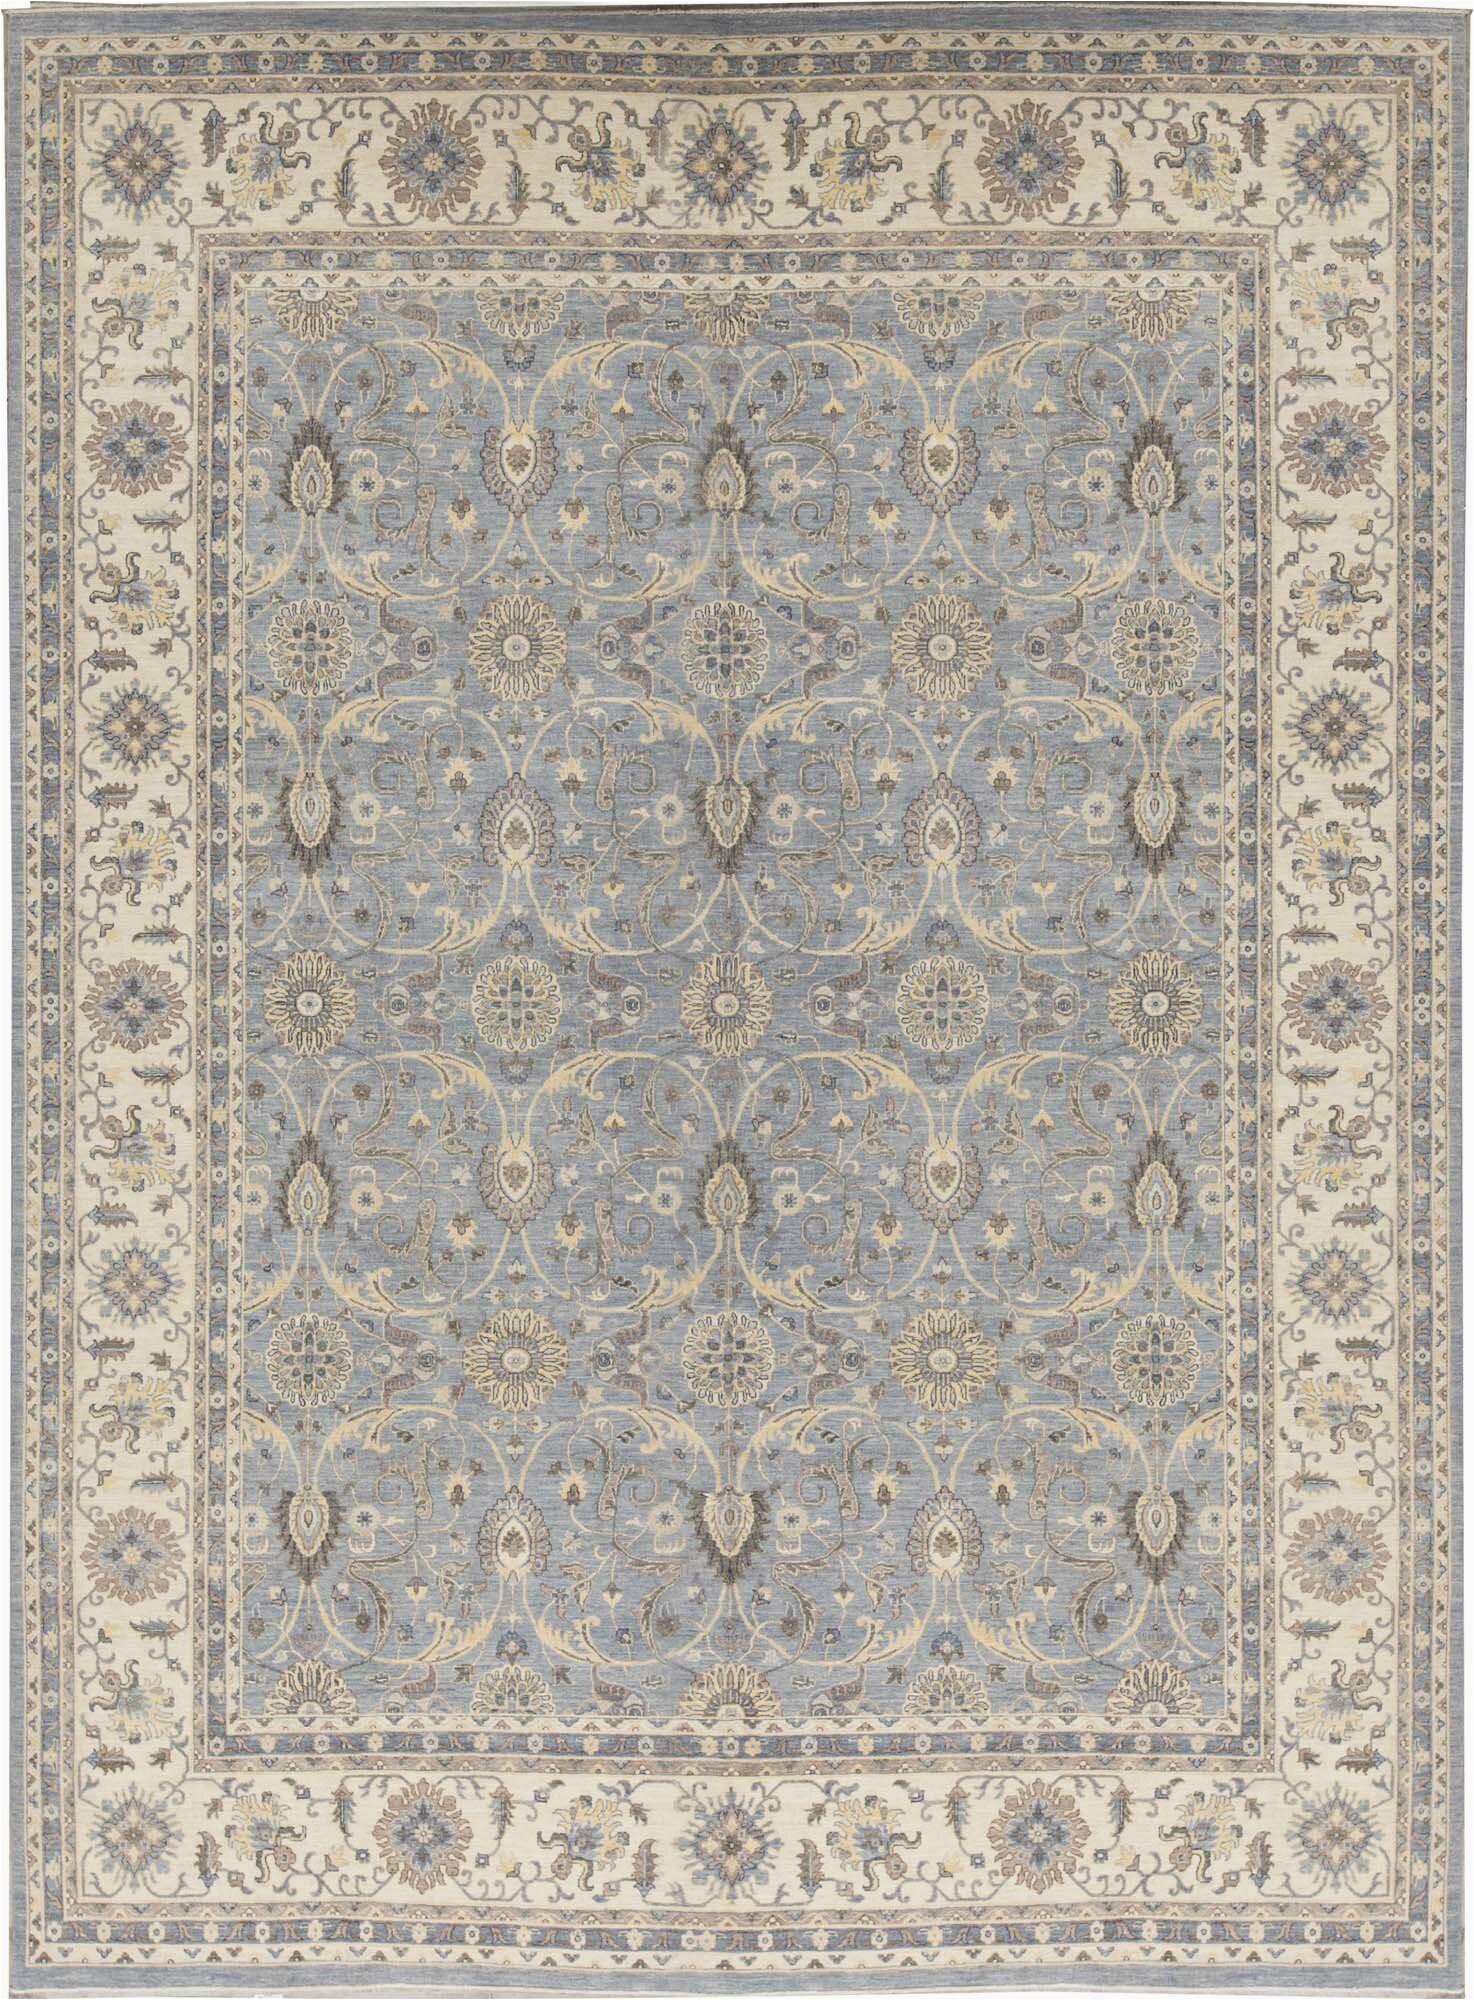 bokara rug co inc one of a kind oriental hand knotted 117 x 148 wool gray area rug abib8941